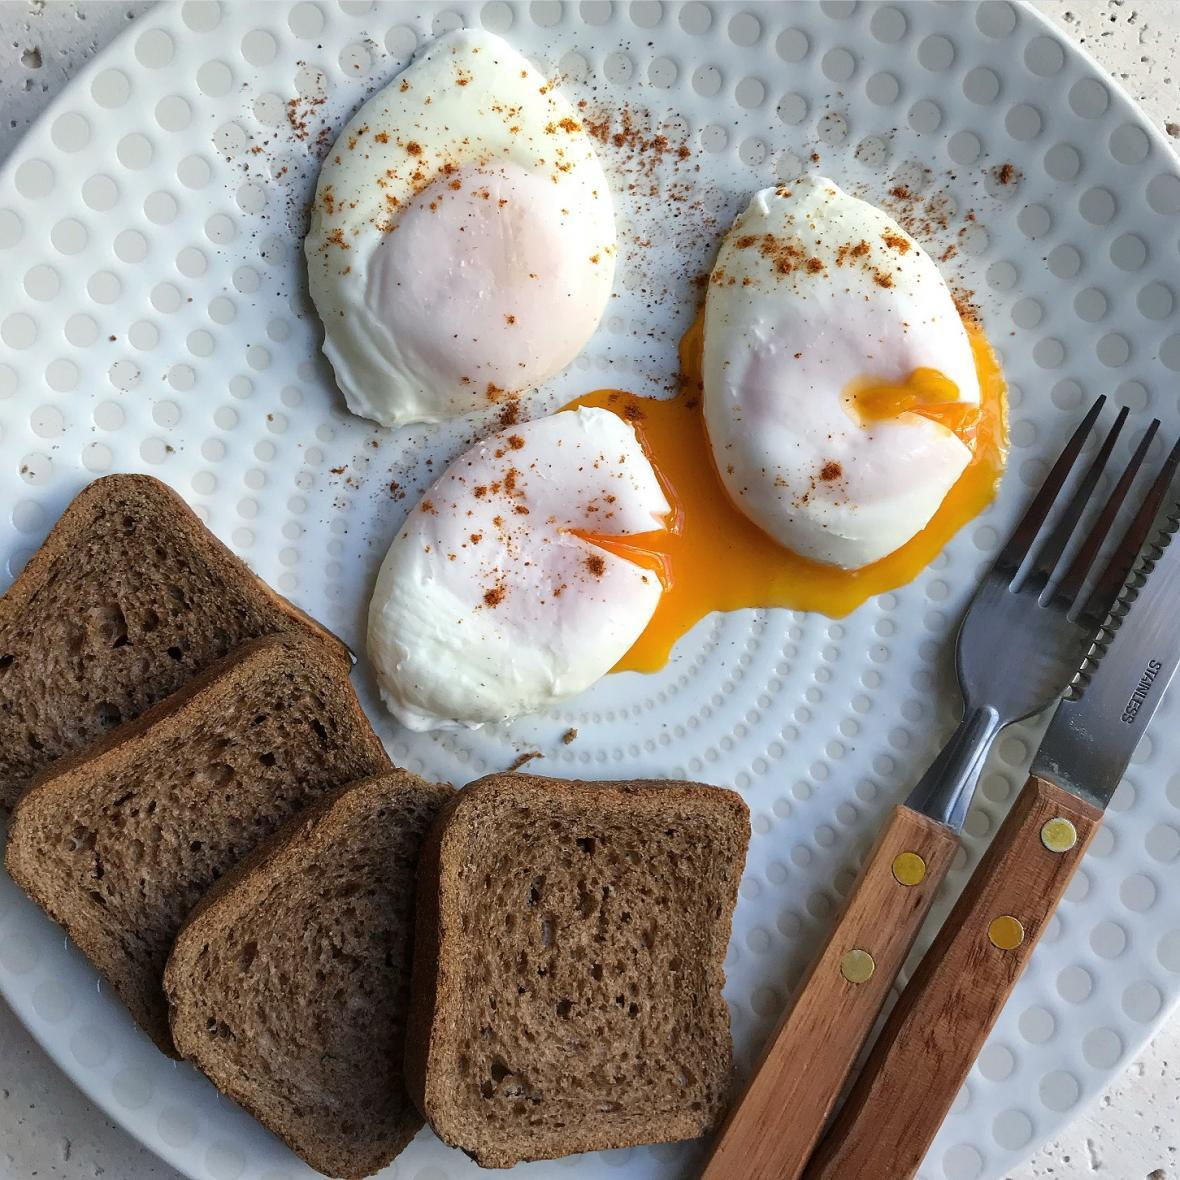 روش تهیه تخم مرغ آب پز بدون پوست (پوچد اگز)